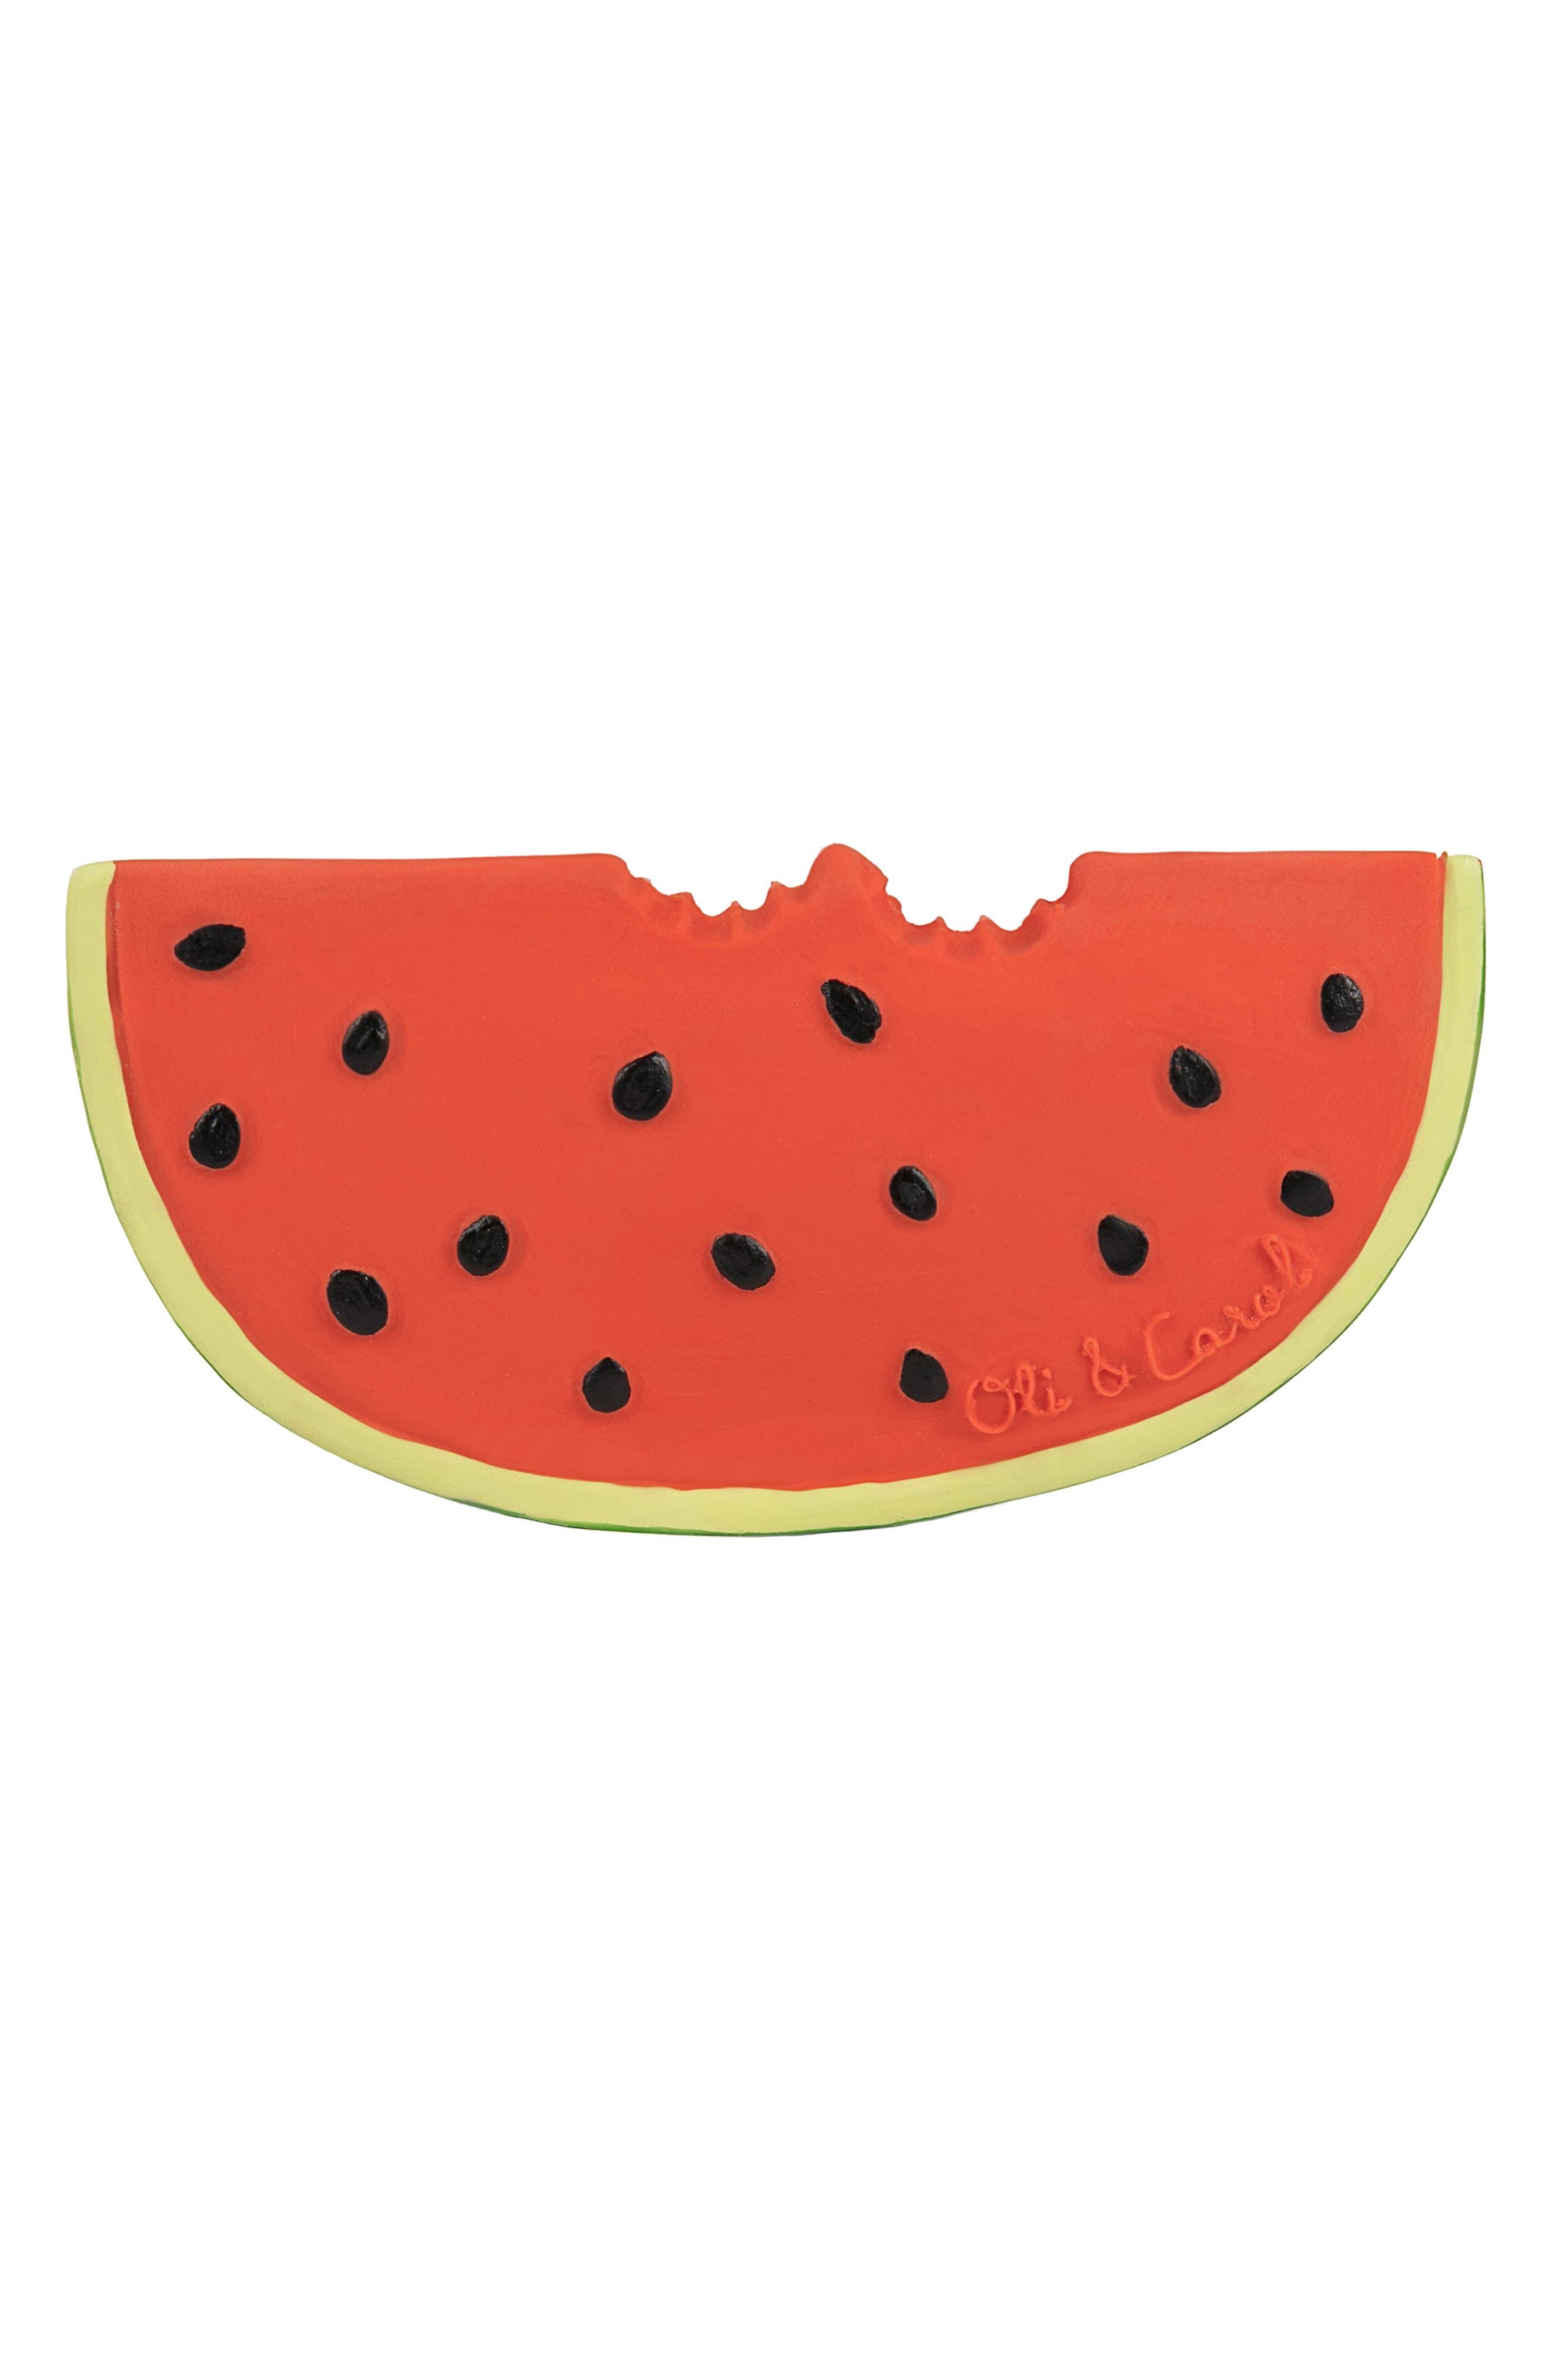 OLI & CAROL, Oli and Carol Wally the Watermelon Teething Toy, Alternate thumbnail 2, color, 600